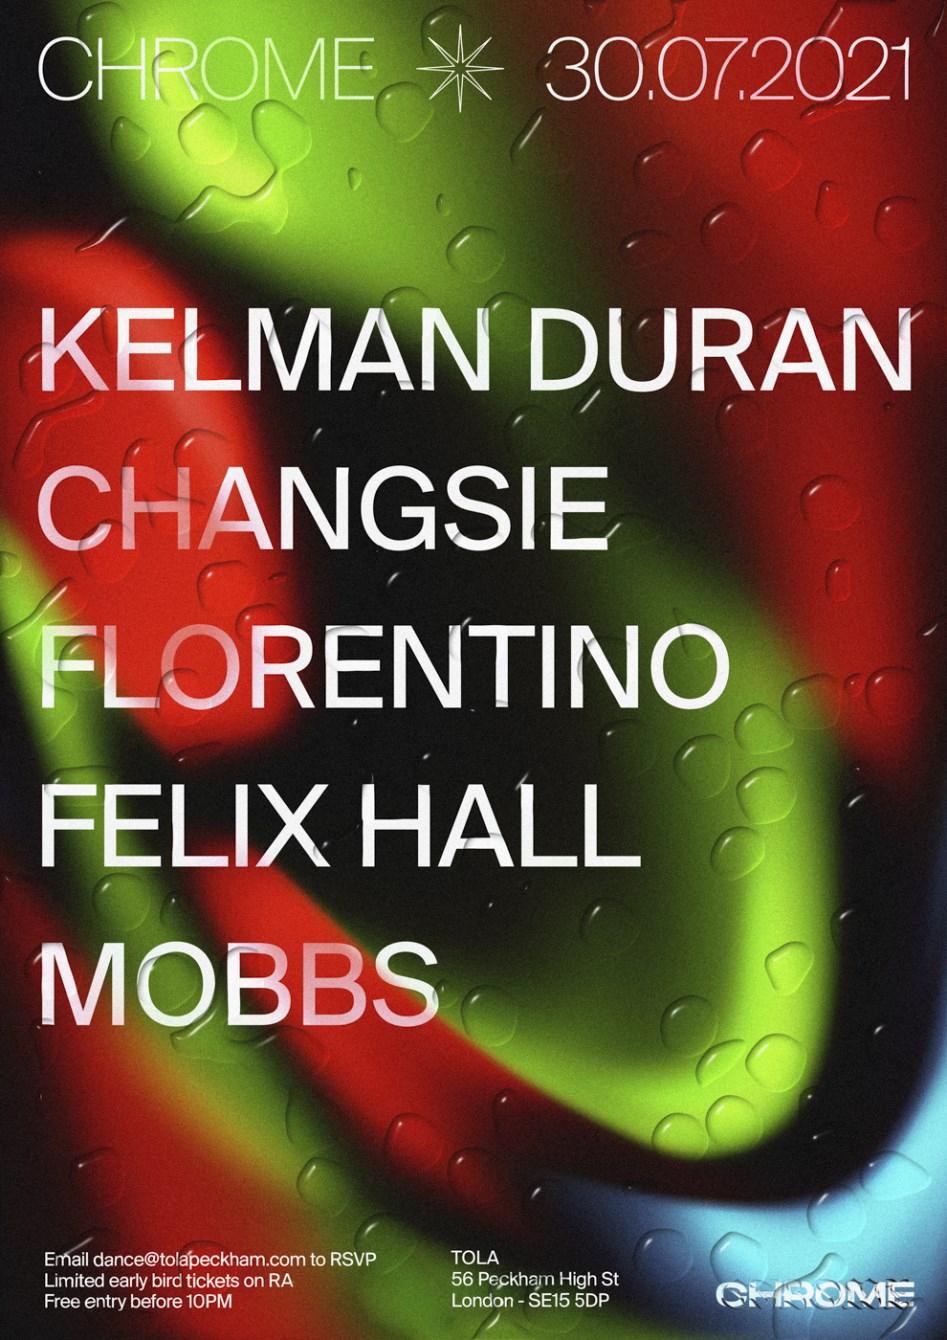 Chrome: Changsie + Florentino + Kelman Duran + Mobbs + Felix Hall - Flyer front